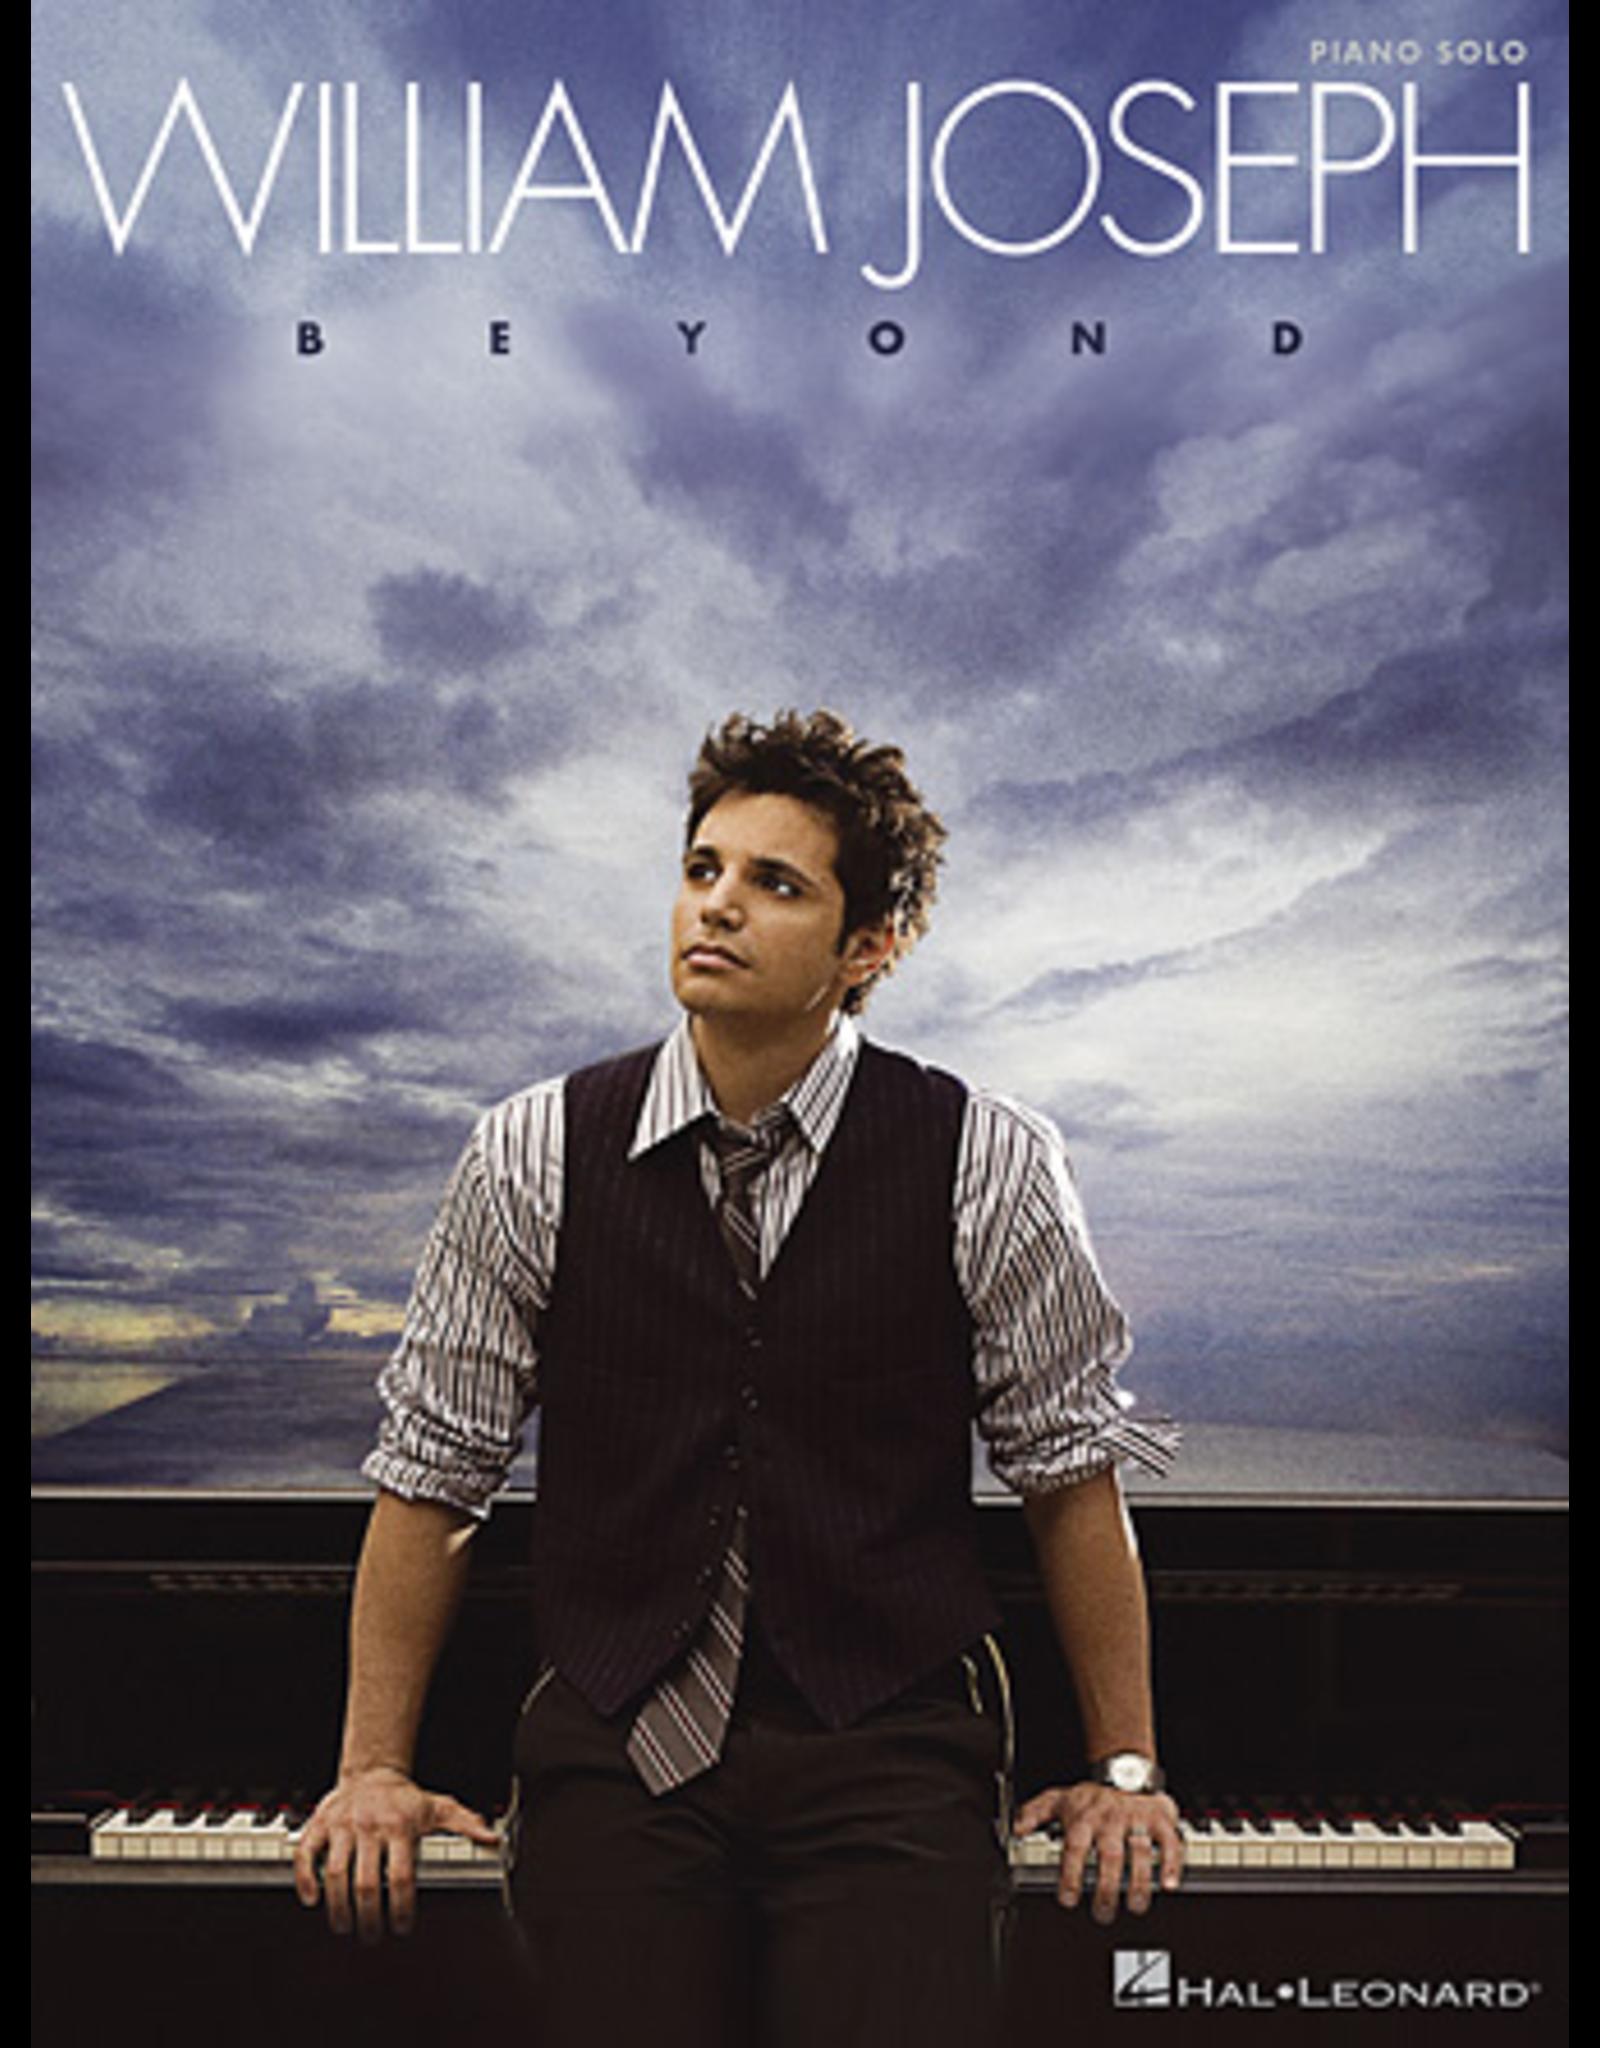 Hal Leonard William Joseph - Beyond Piano Solo